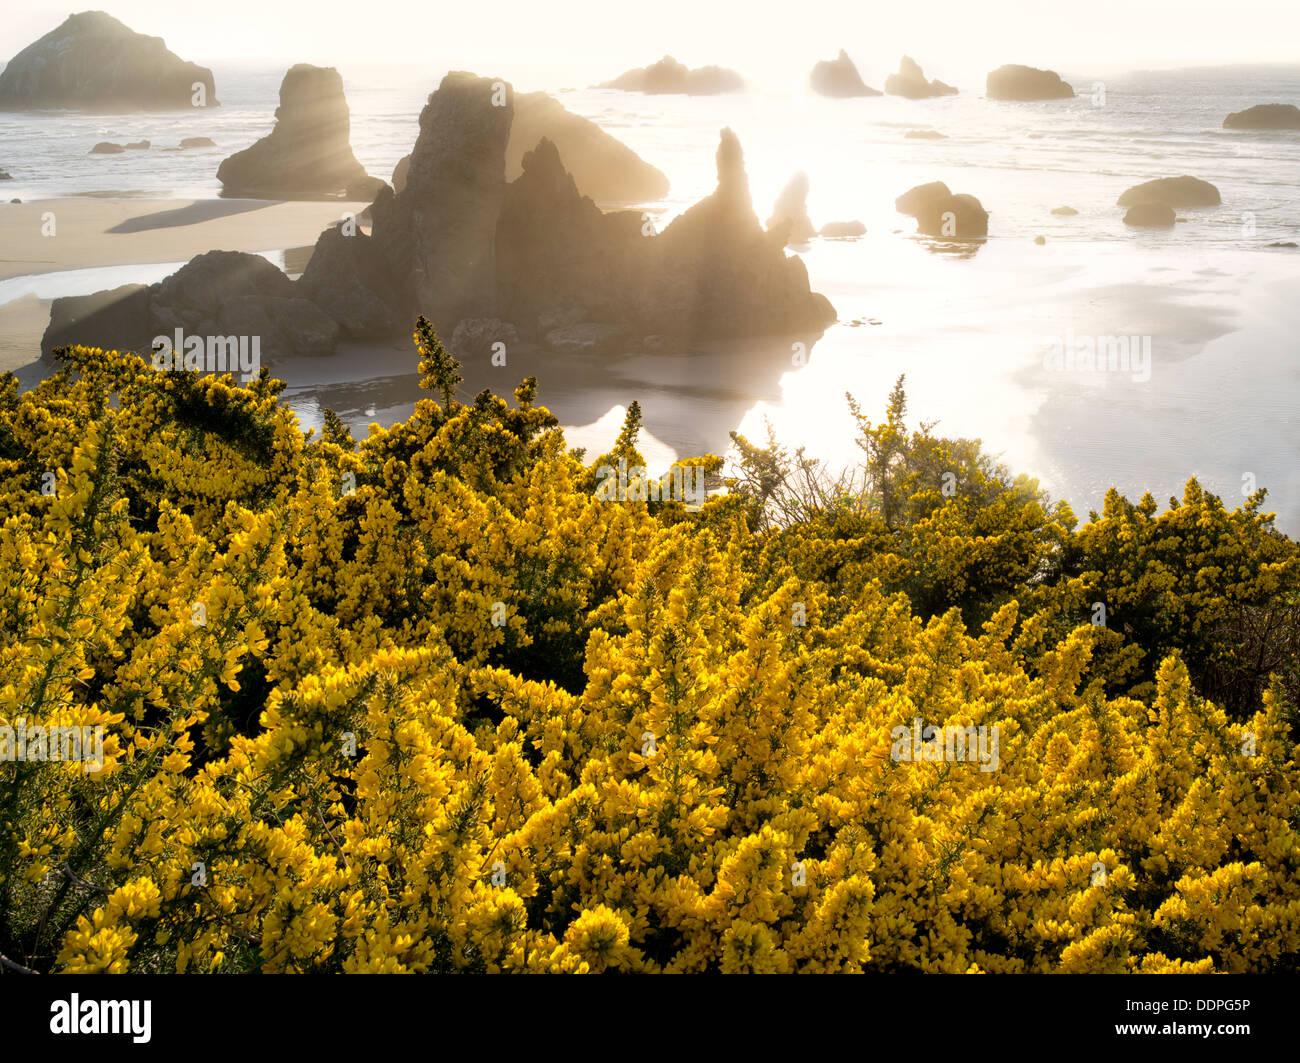 Gorse wildflowers and coastline at Bandon, Oregon. - Stock Image